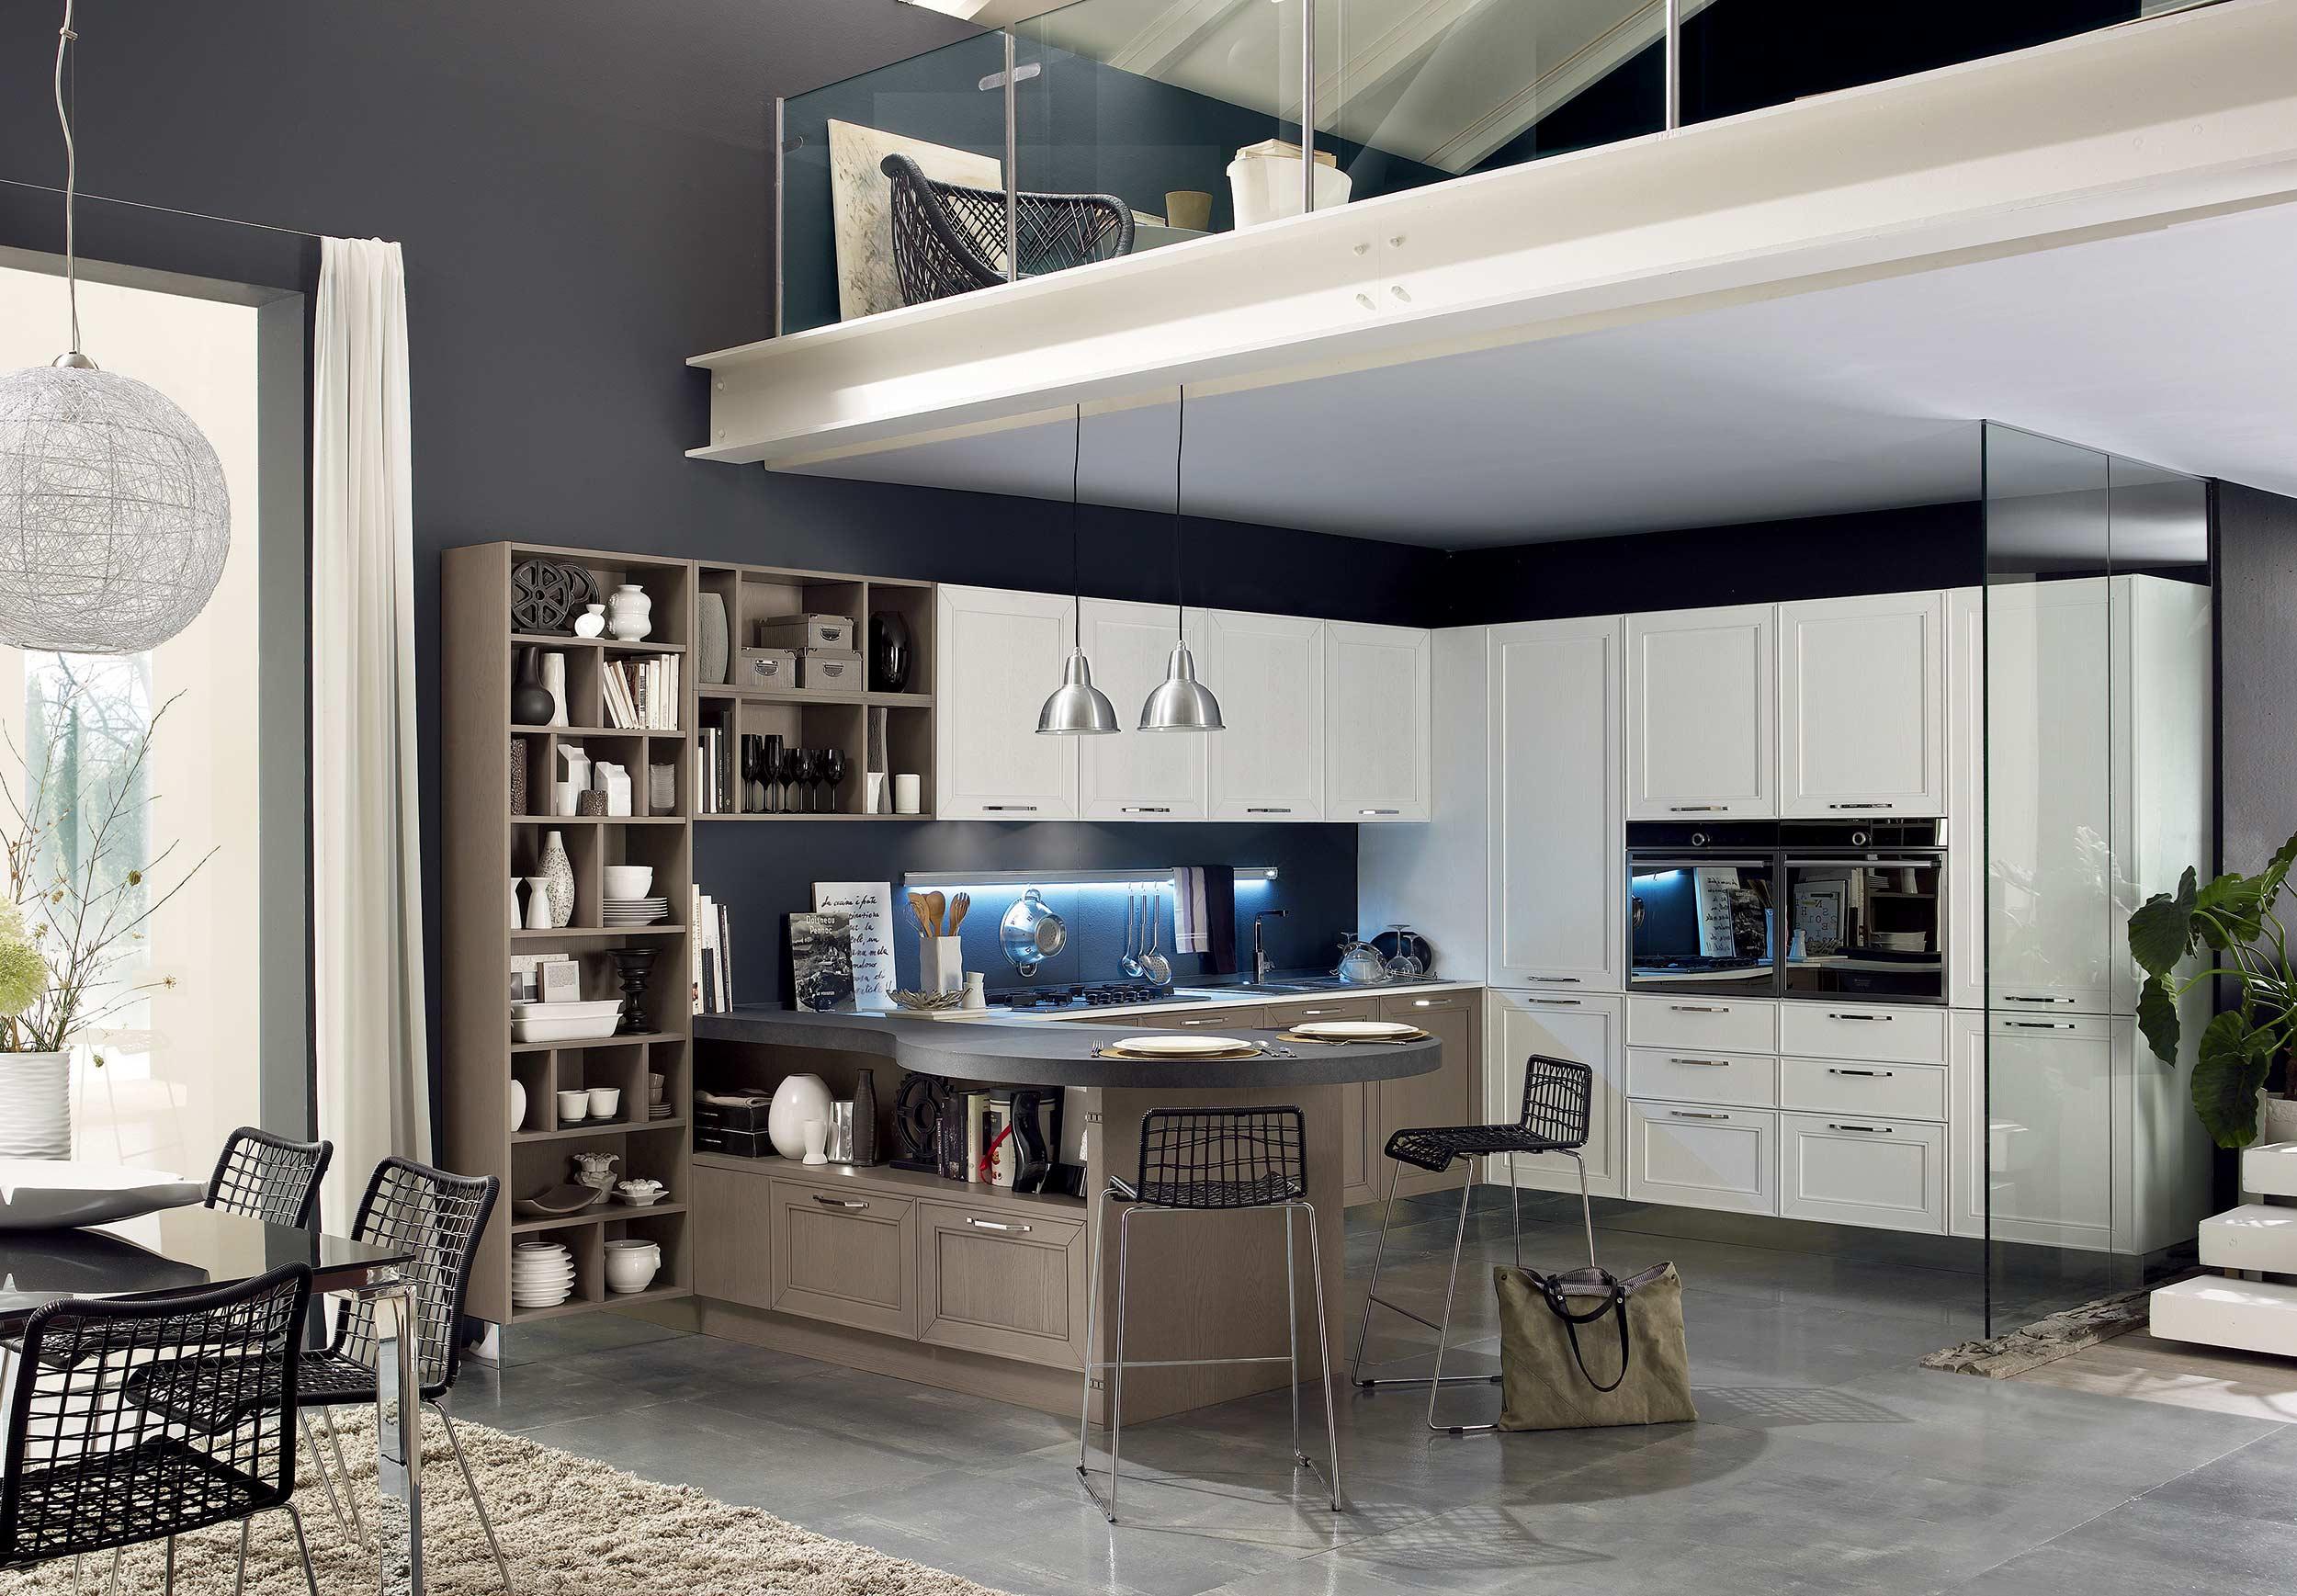 cucina maxim stosa cucine ravenna. Black Bedroom Furniture Sets. Home Design Ideas